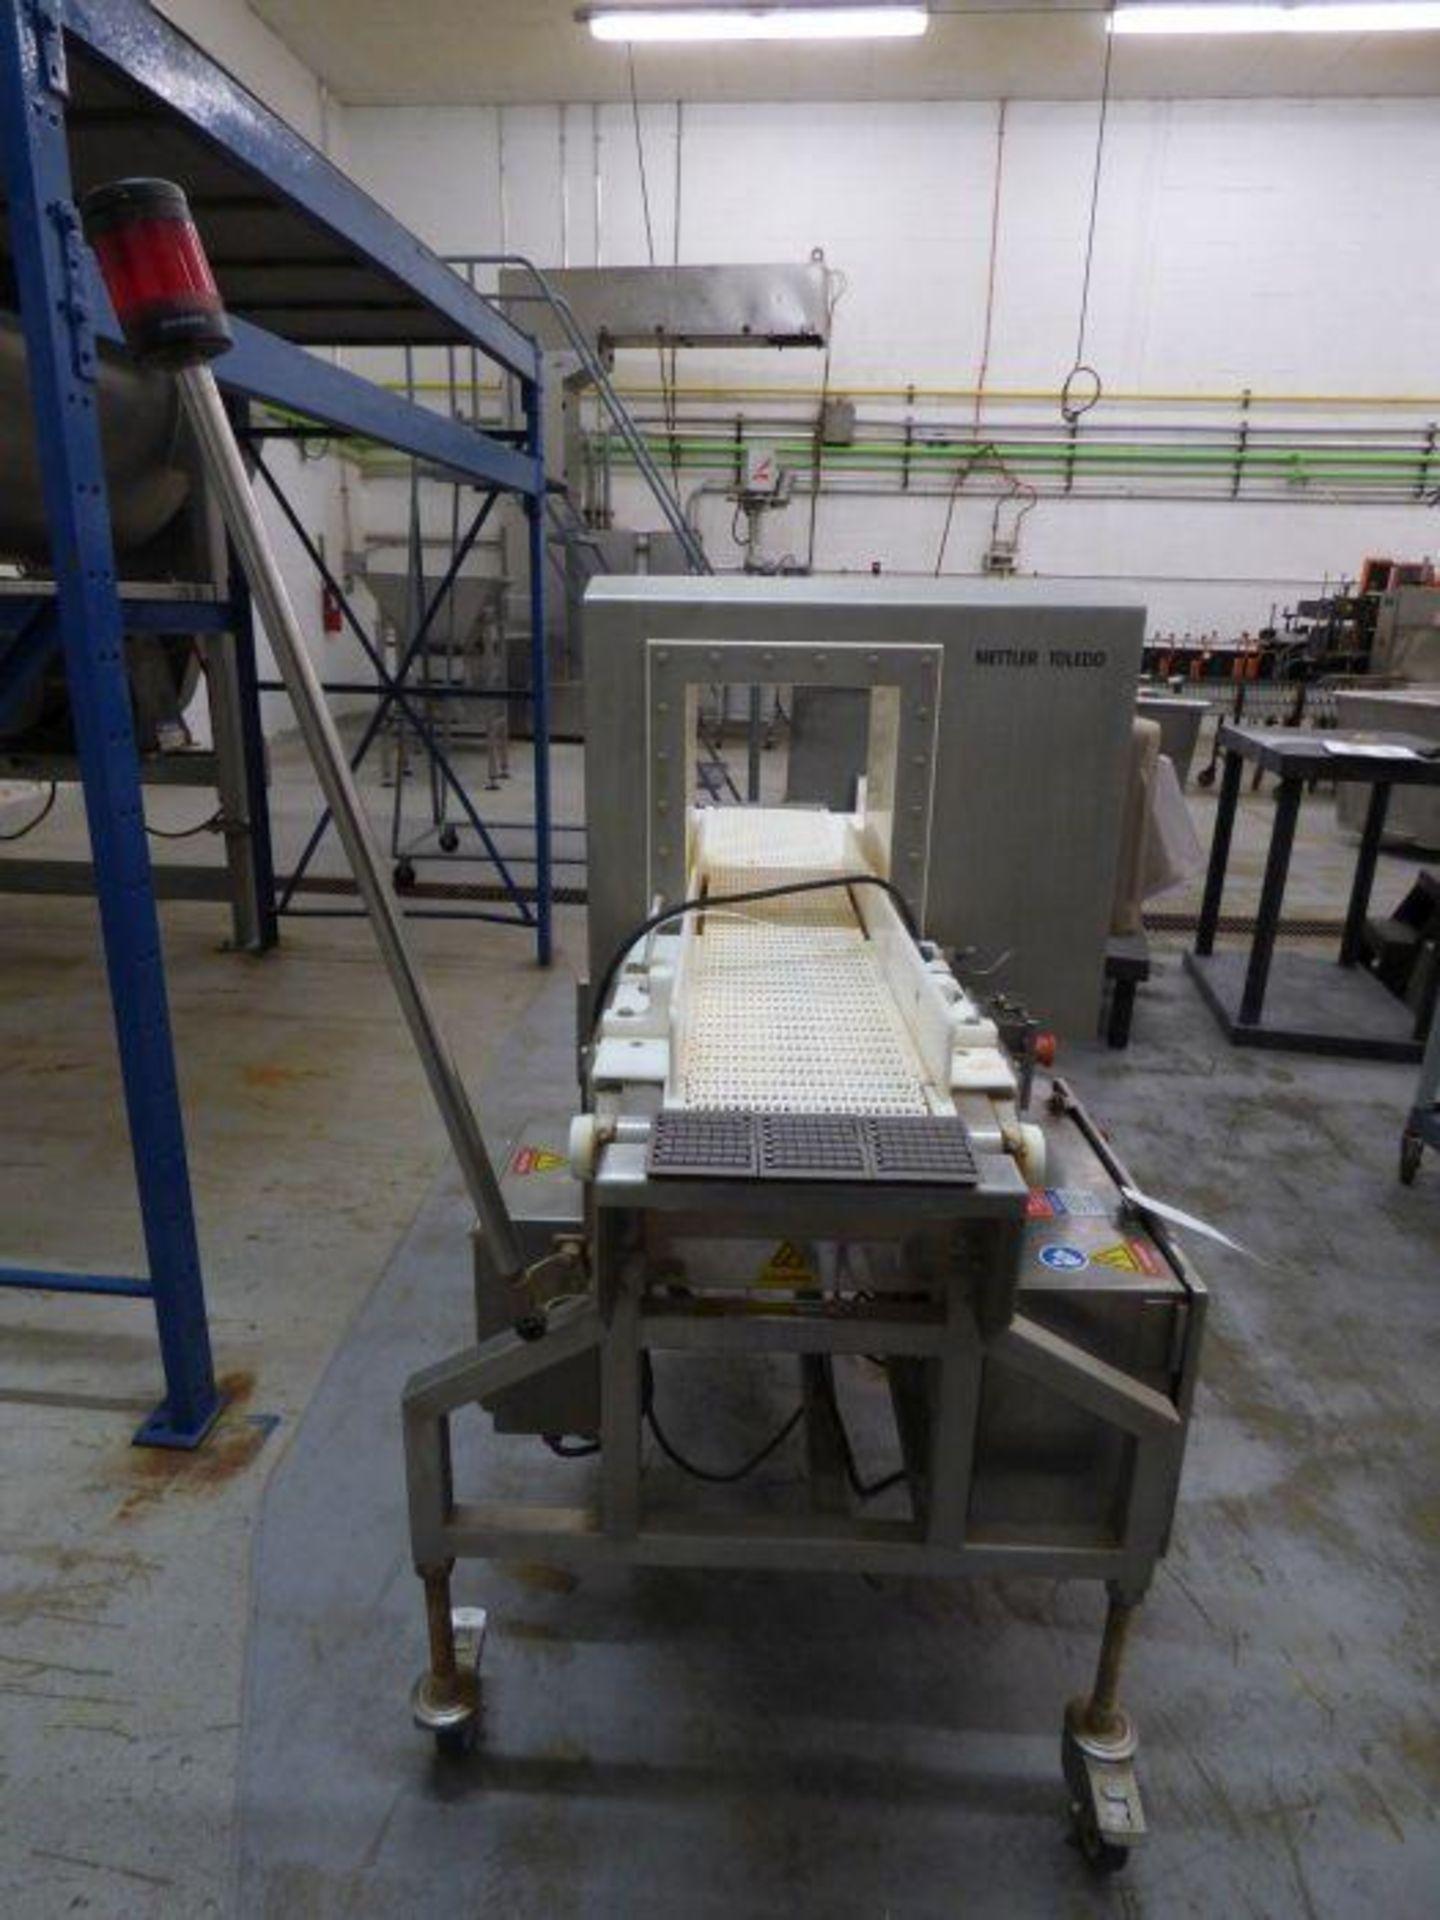 Lot 1187 - 2018 Mettler Toledo Stainless Steel Integrated In-Line Metal Detector